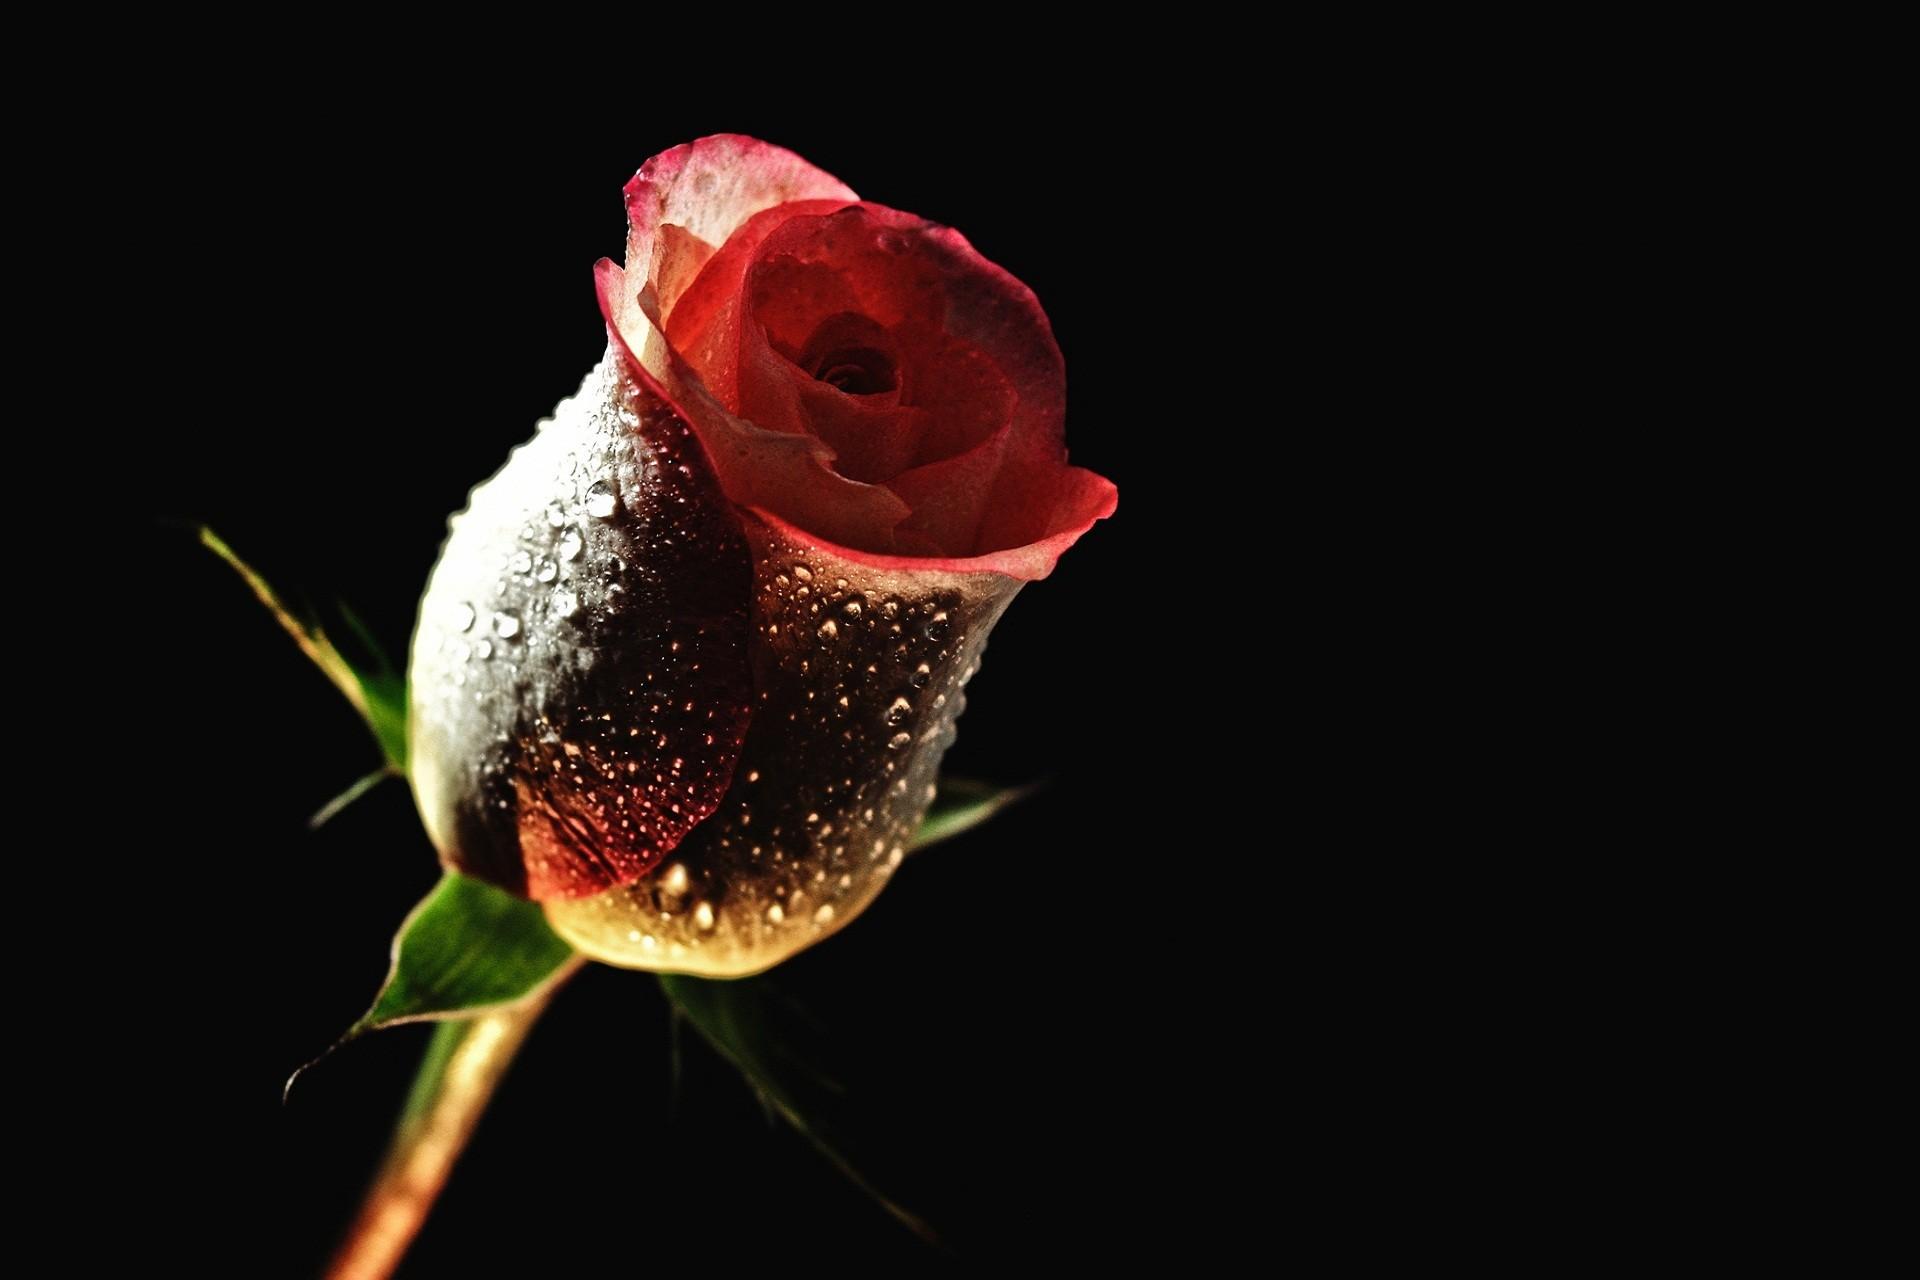 Rose Love Wallpaper Good Night   Data-src /w/full/5/6/0/431085 - High Definition Wallpapers Of Roses - HD Wallpaper